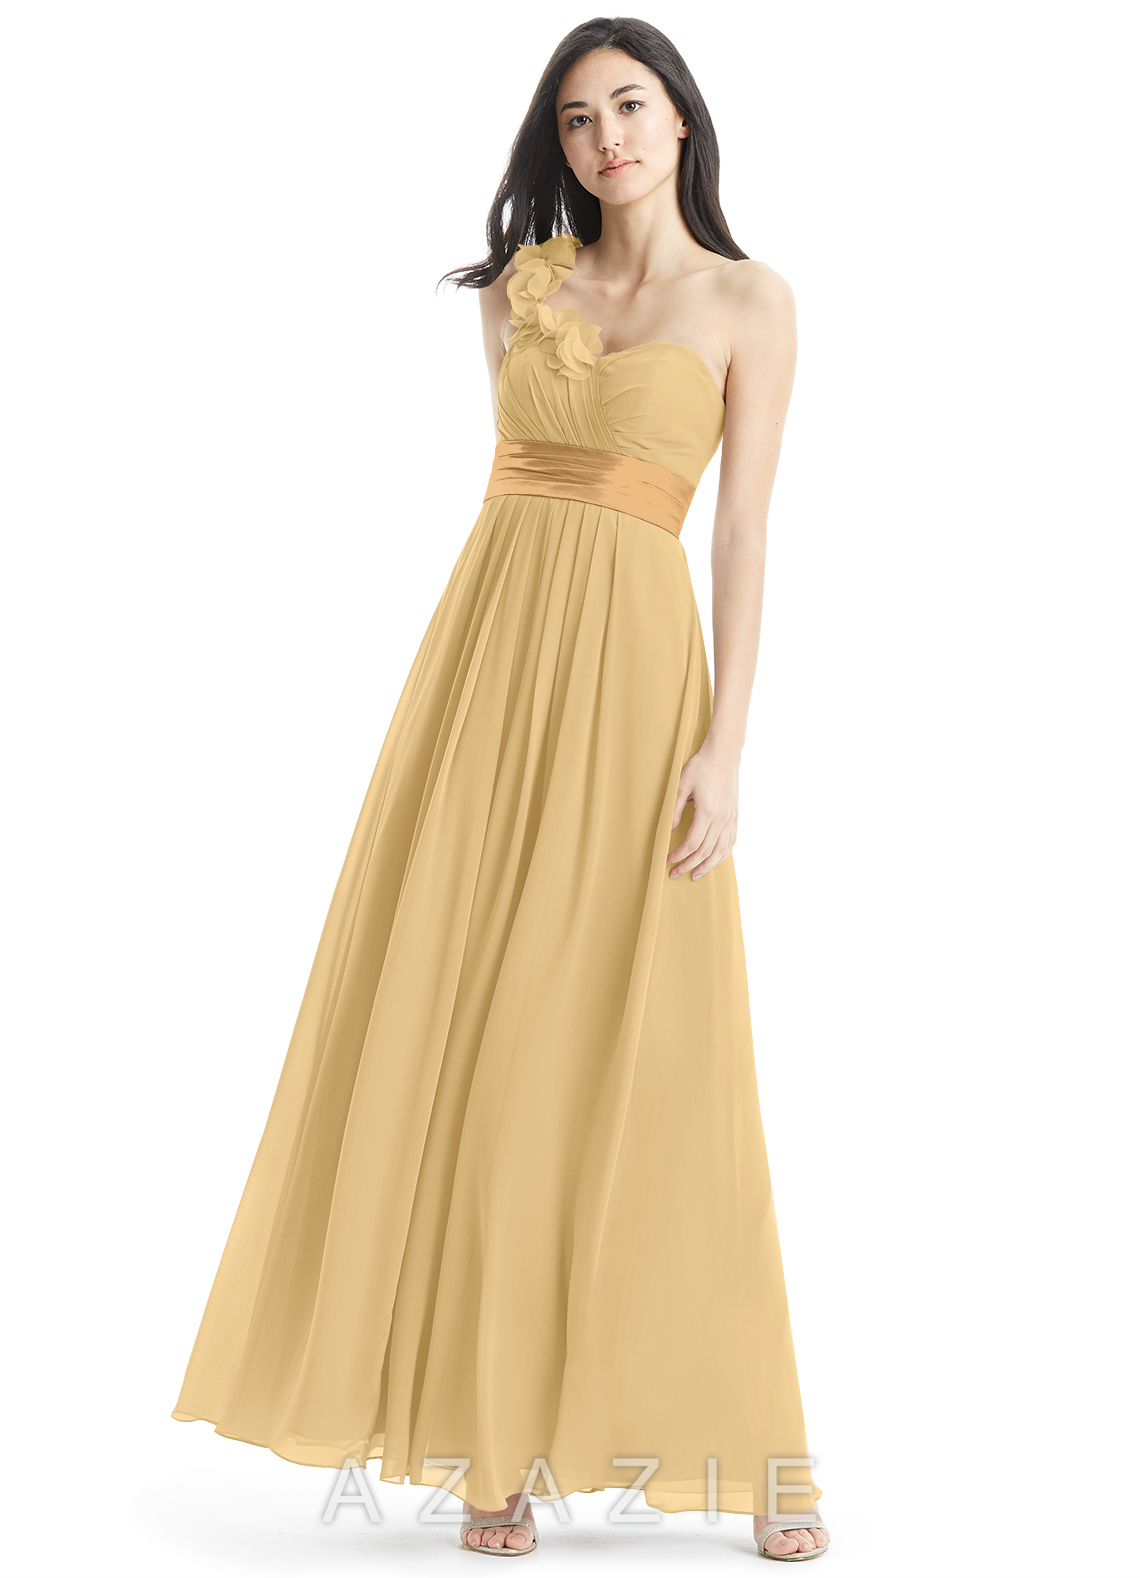 Azazie Evelyn Bridesmaid Dress | Azazie - photo #8